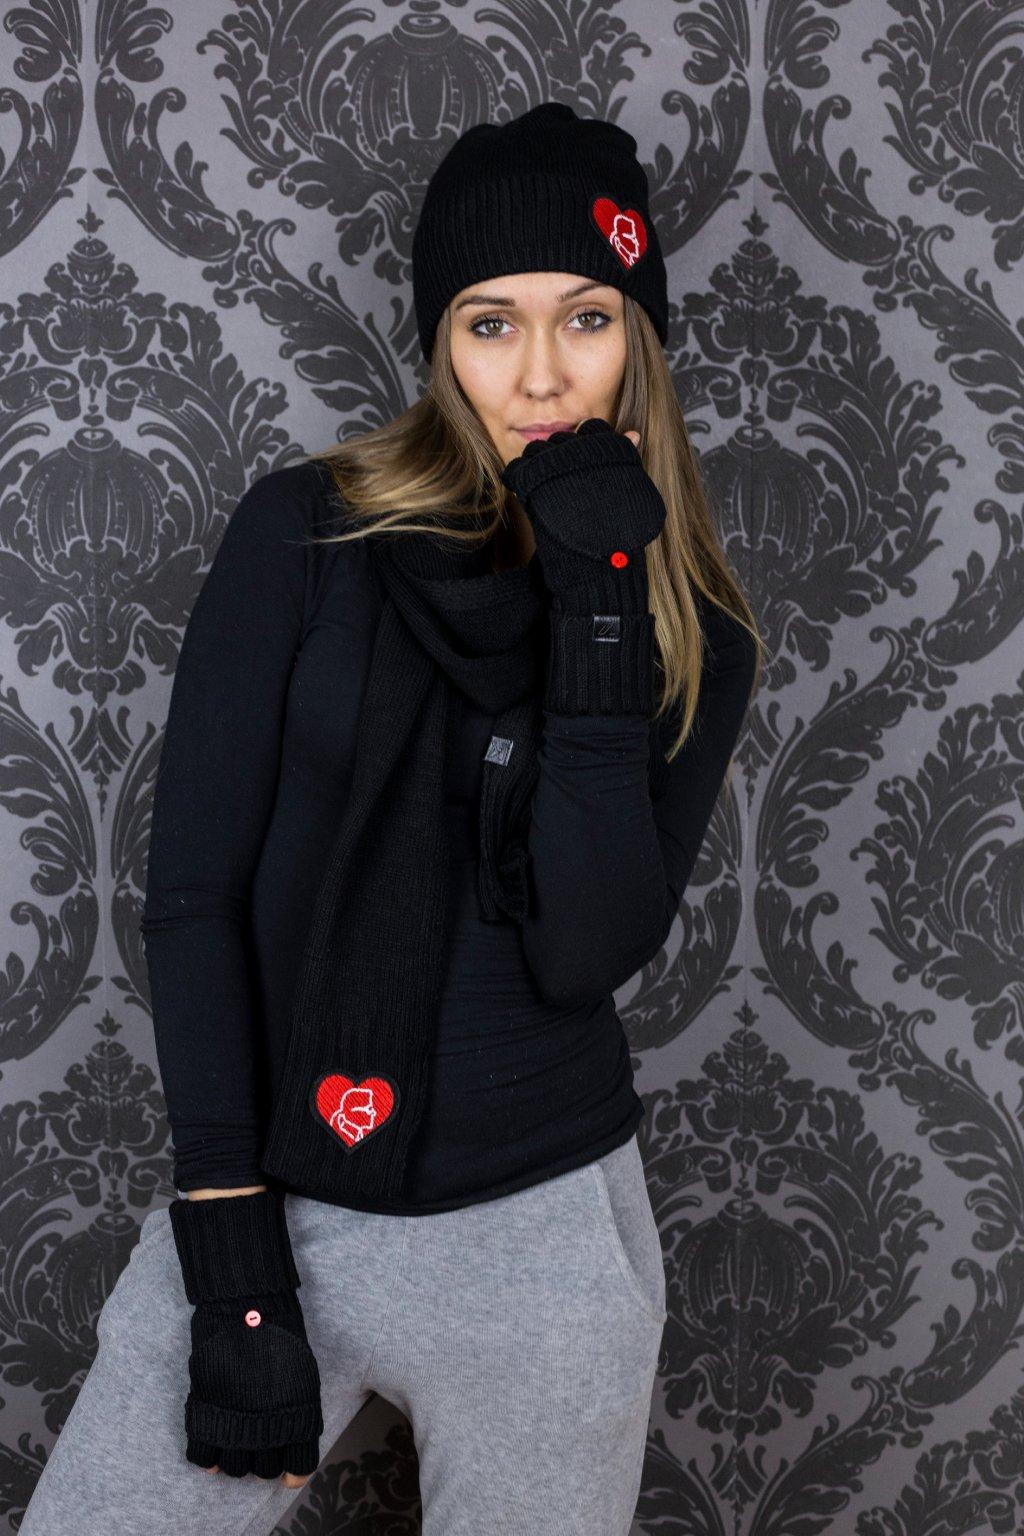 Dámský set Karl Lagerfeld Paris Karl King of Hearts Cold Weather Set Black  Barva  Bílá 5a3e87078c